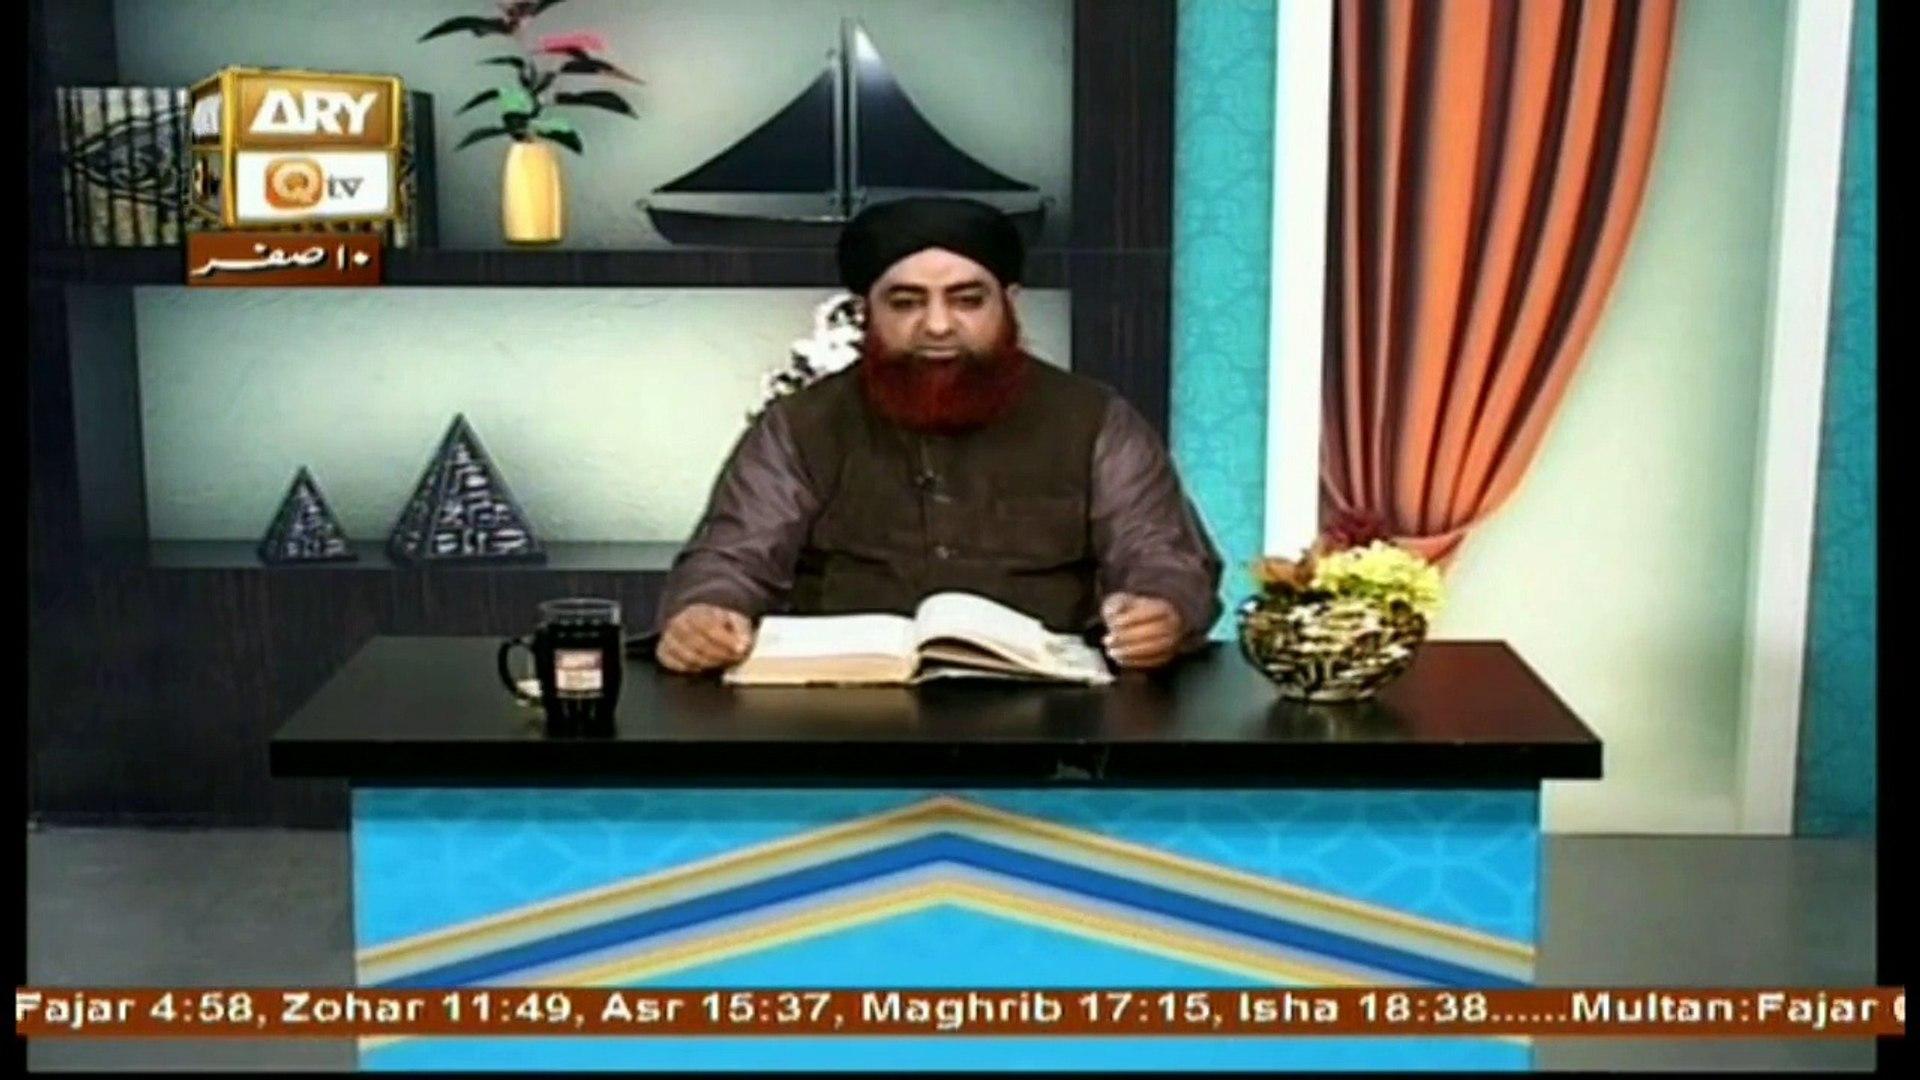 Al-Hadi - Topic - Amanat Me Khayanat